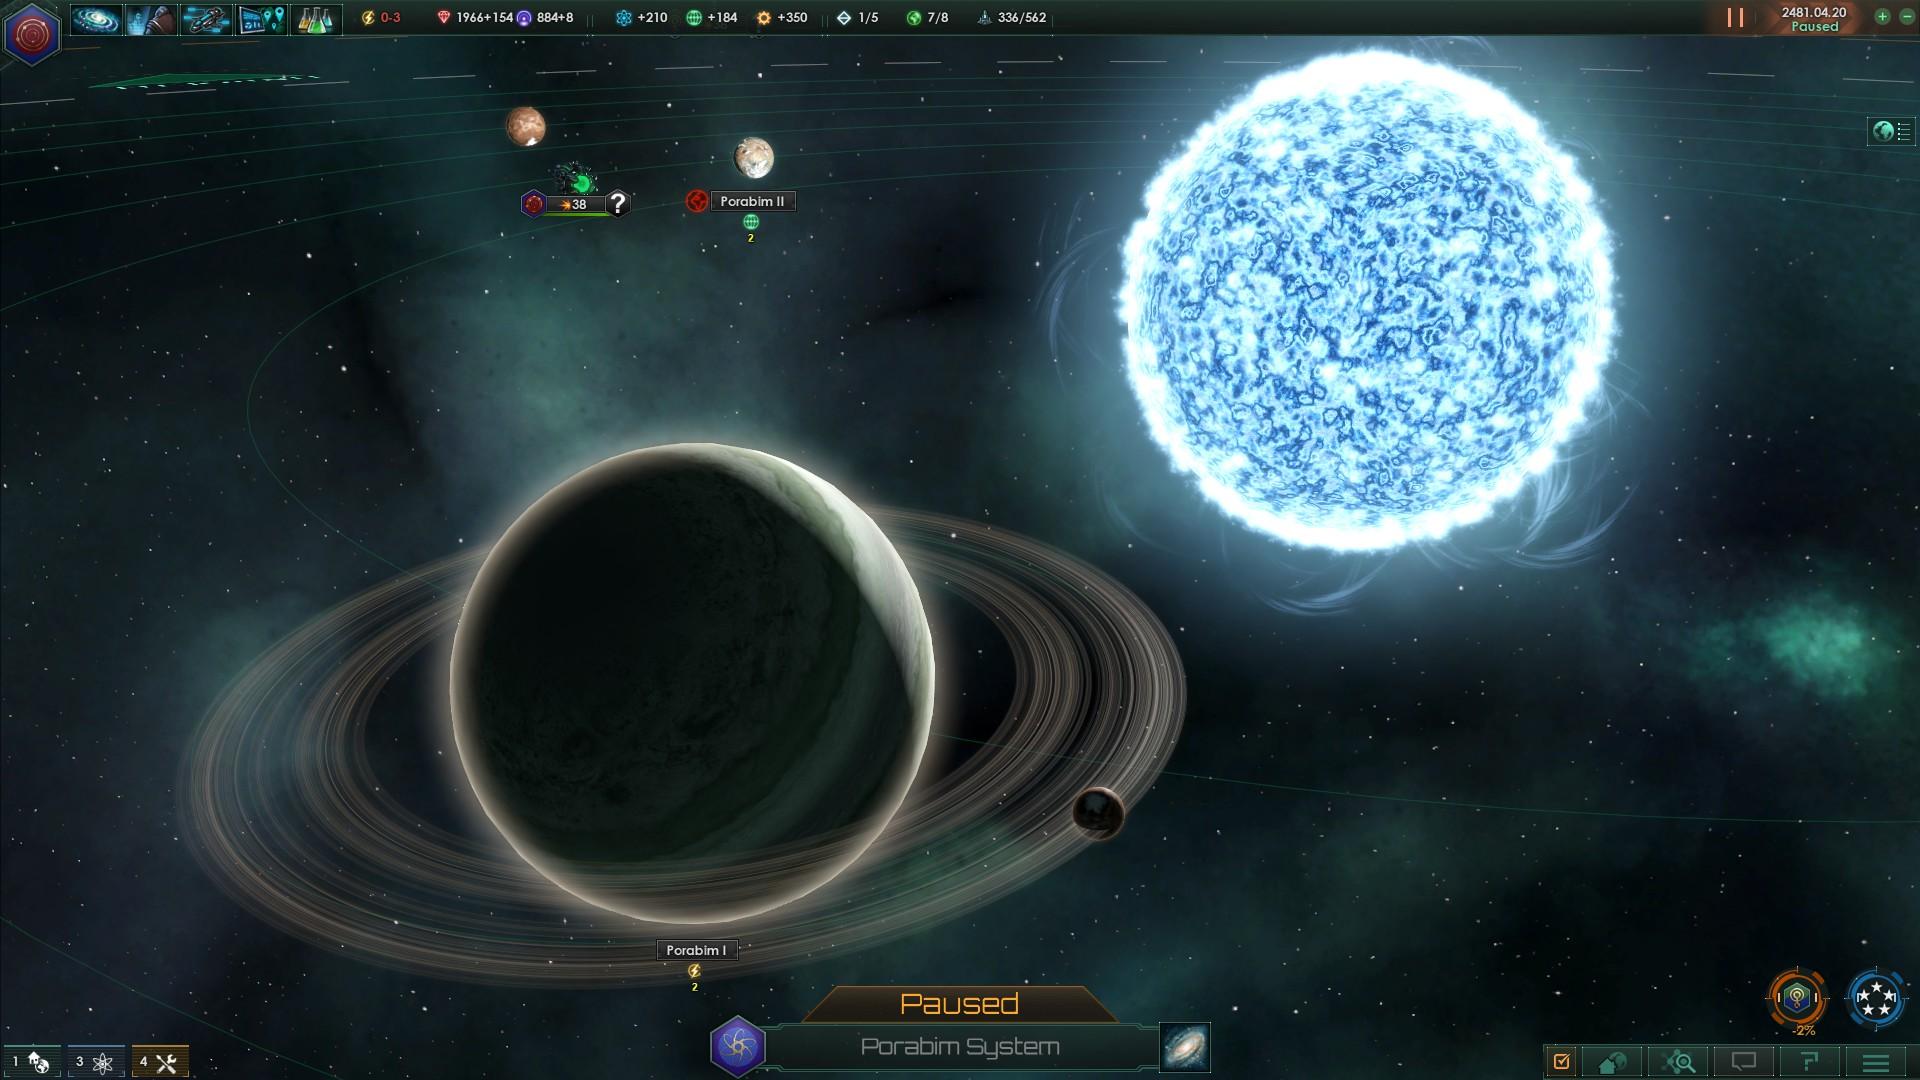 6 things I wish I'd known before starting Stellaris